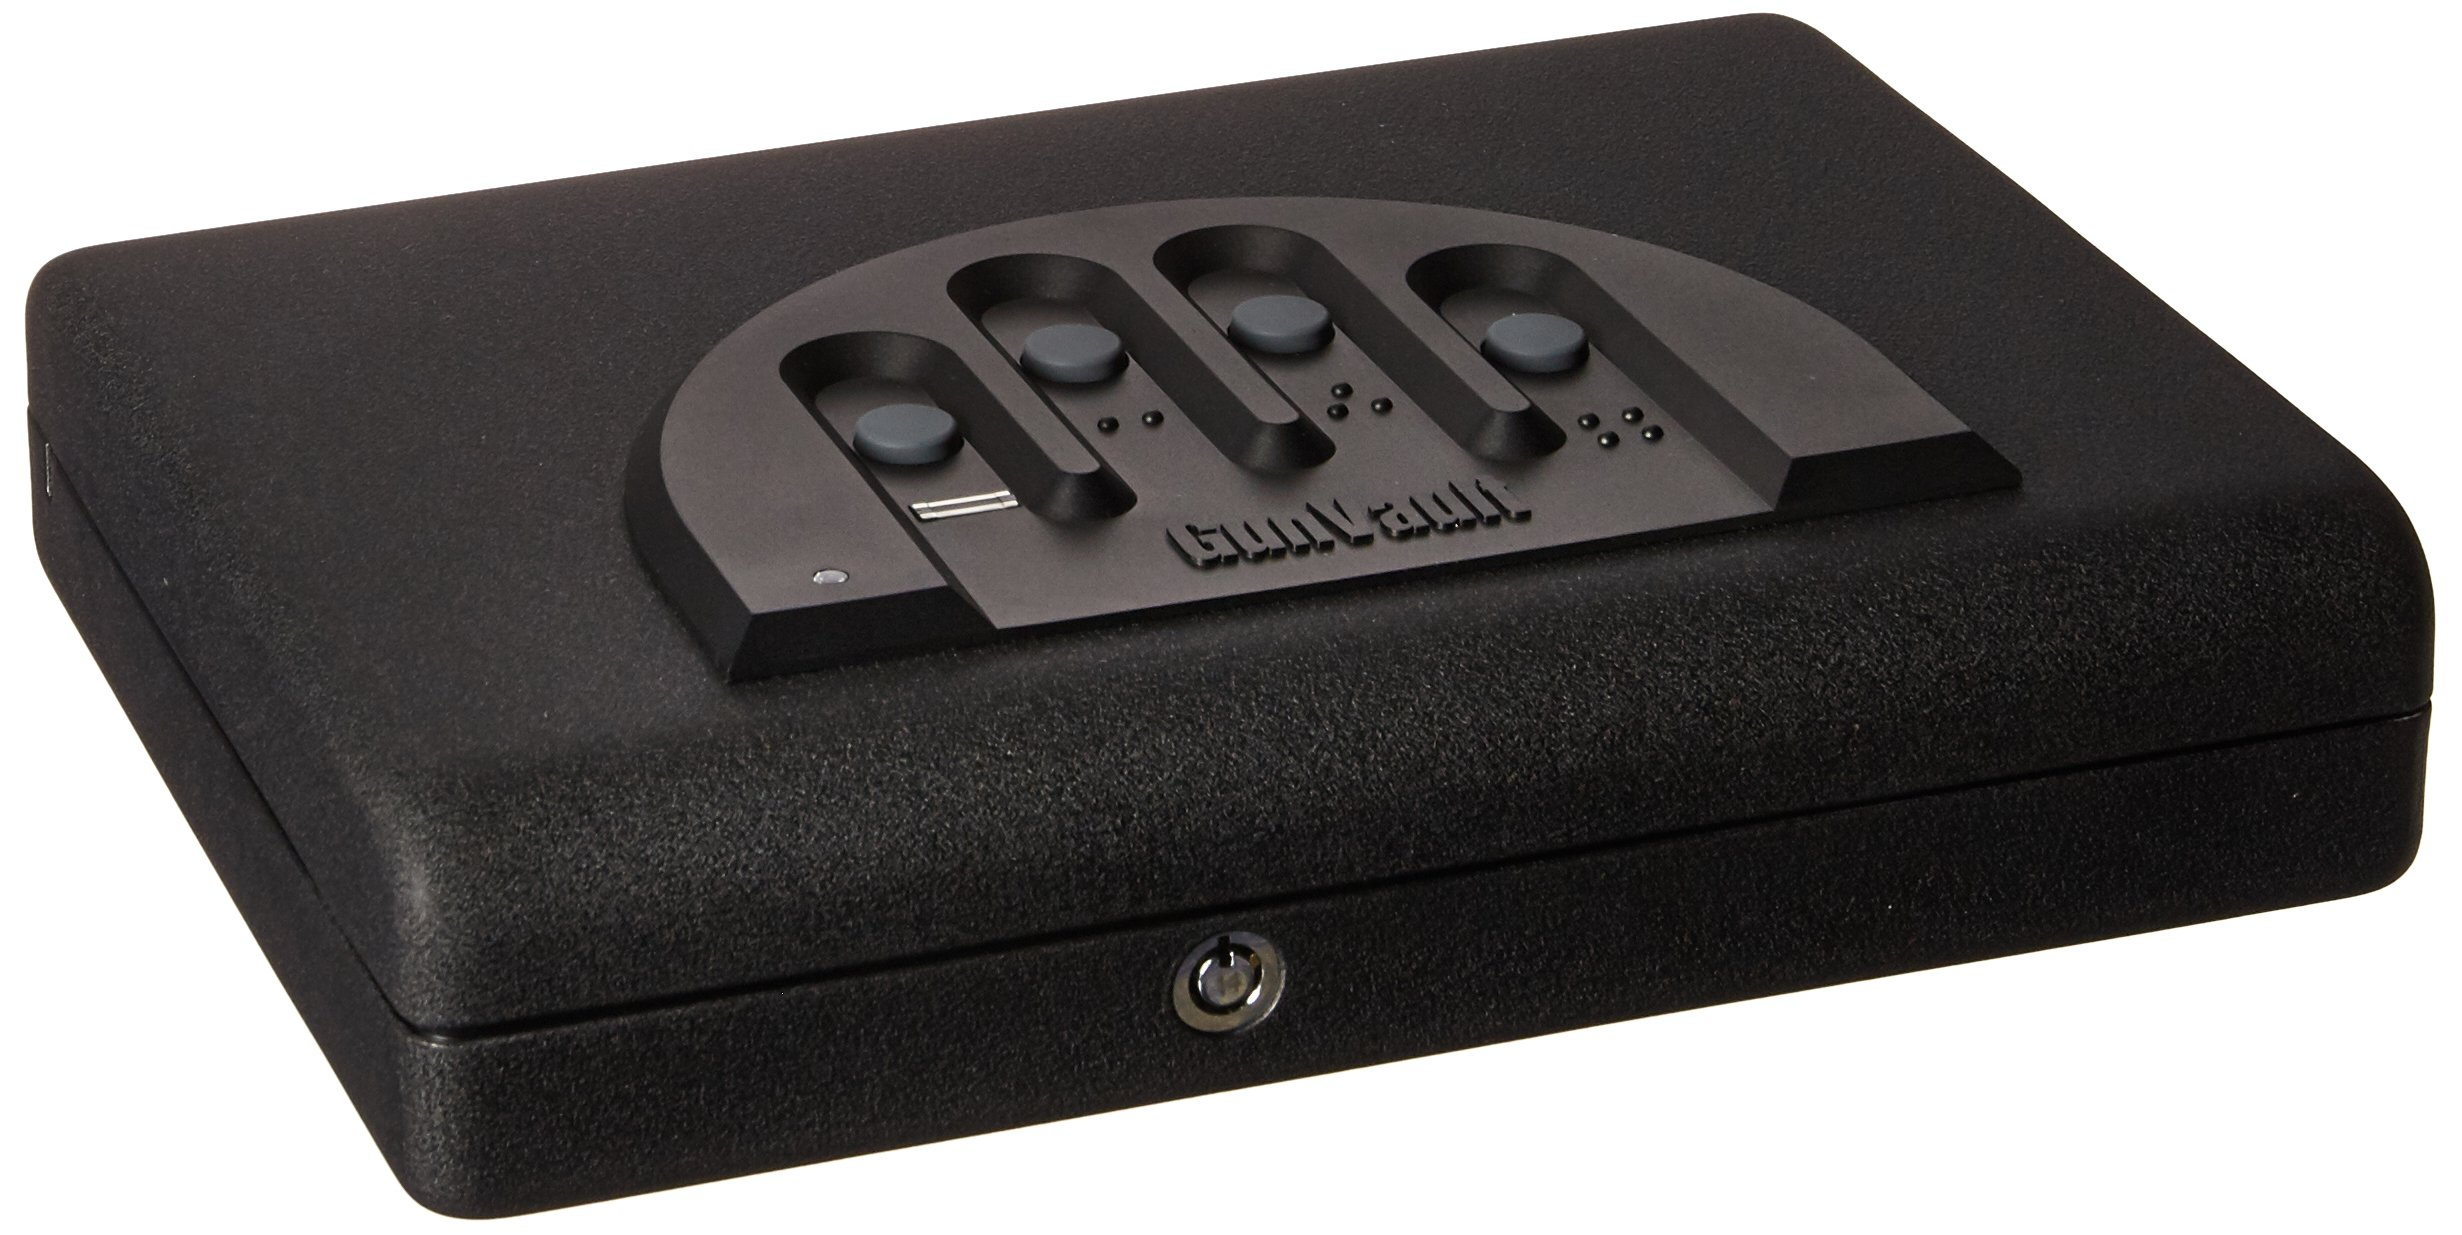 Gunvault MVB500 Microvault Biometric Pistol Gun Safe by GunVault (Image #1)